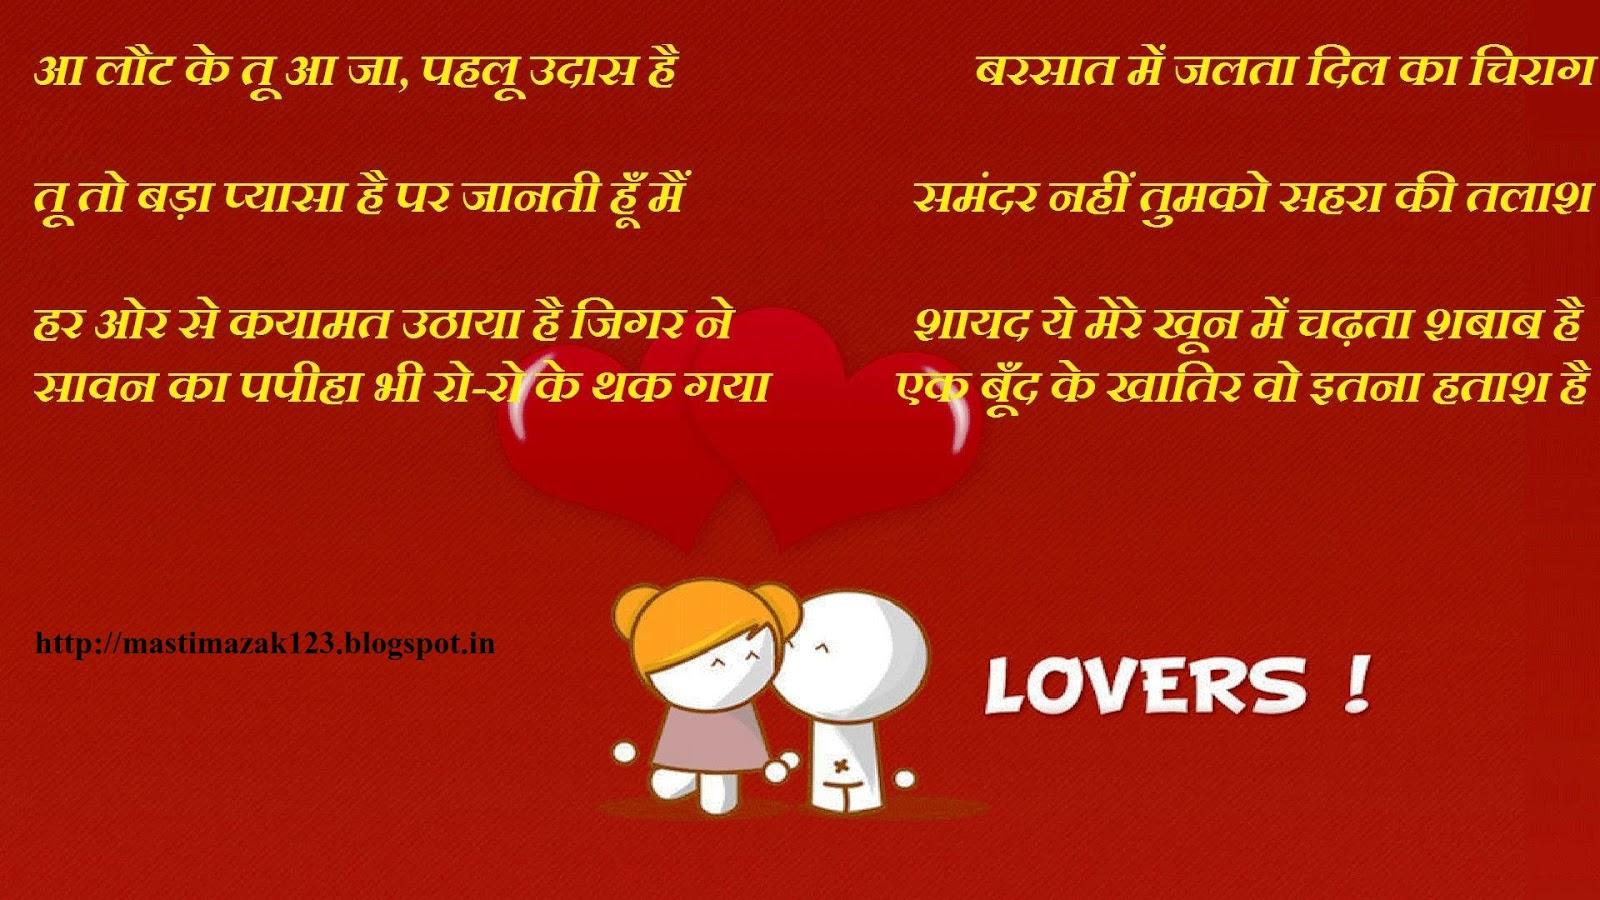 Masti Mazak Romantic Love Msg In Hindi Romantic Sms For Her Love Sms